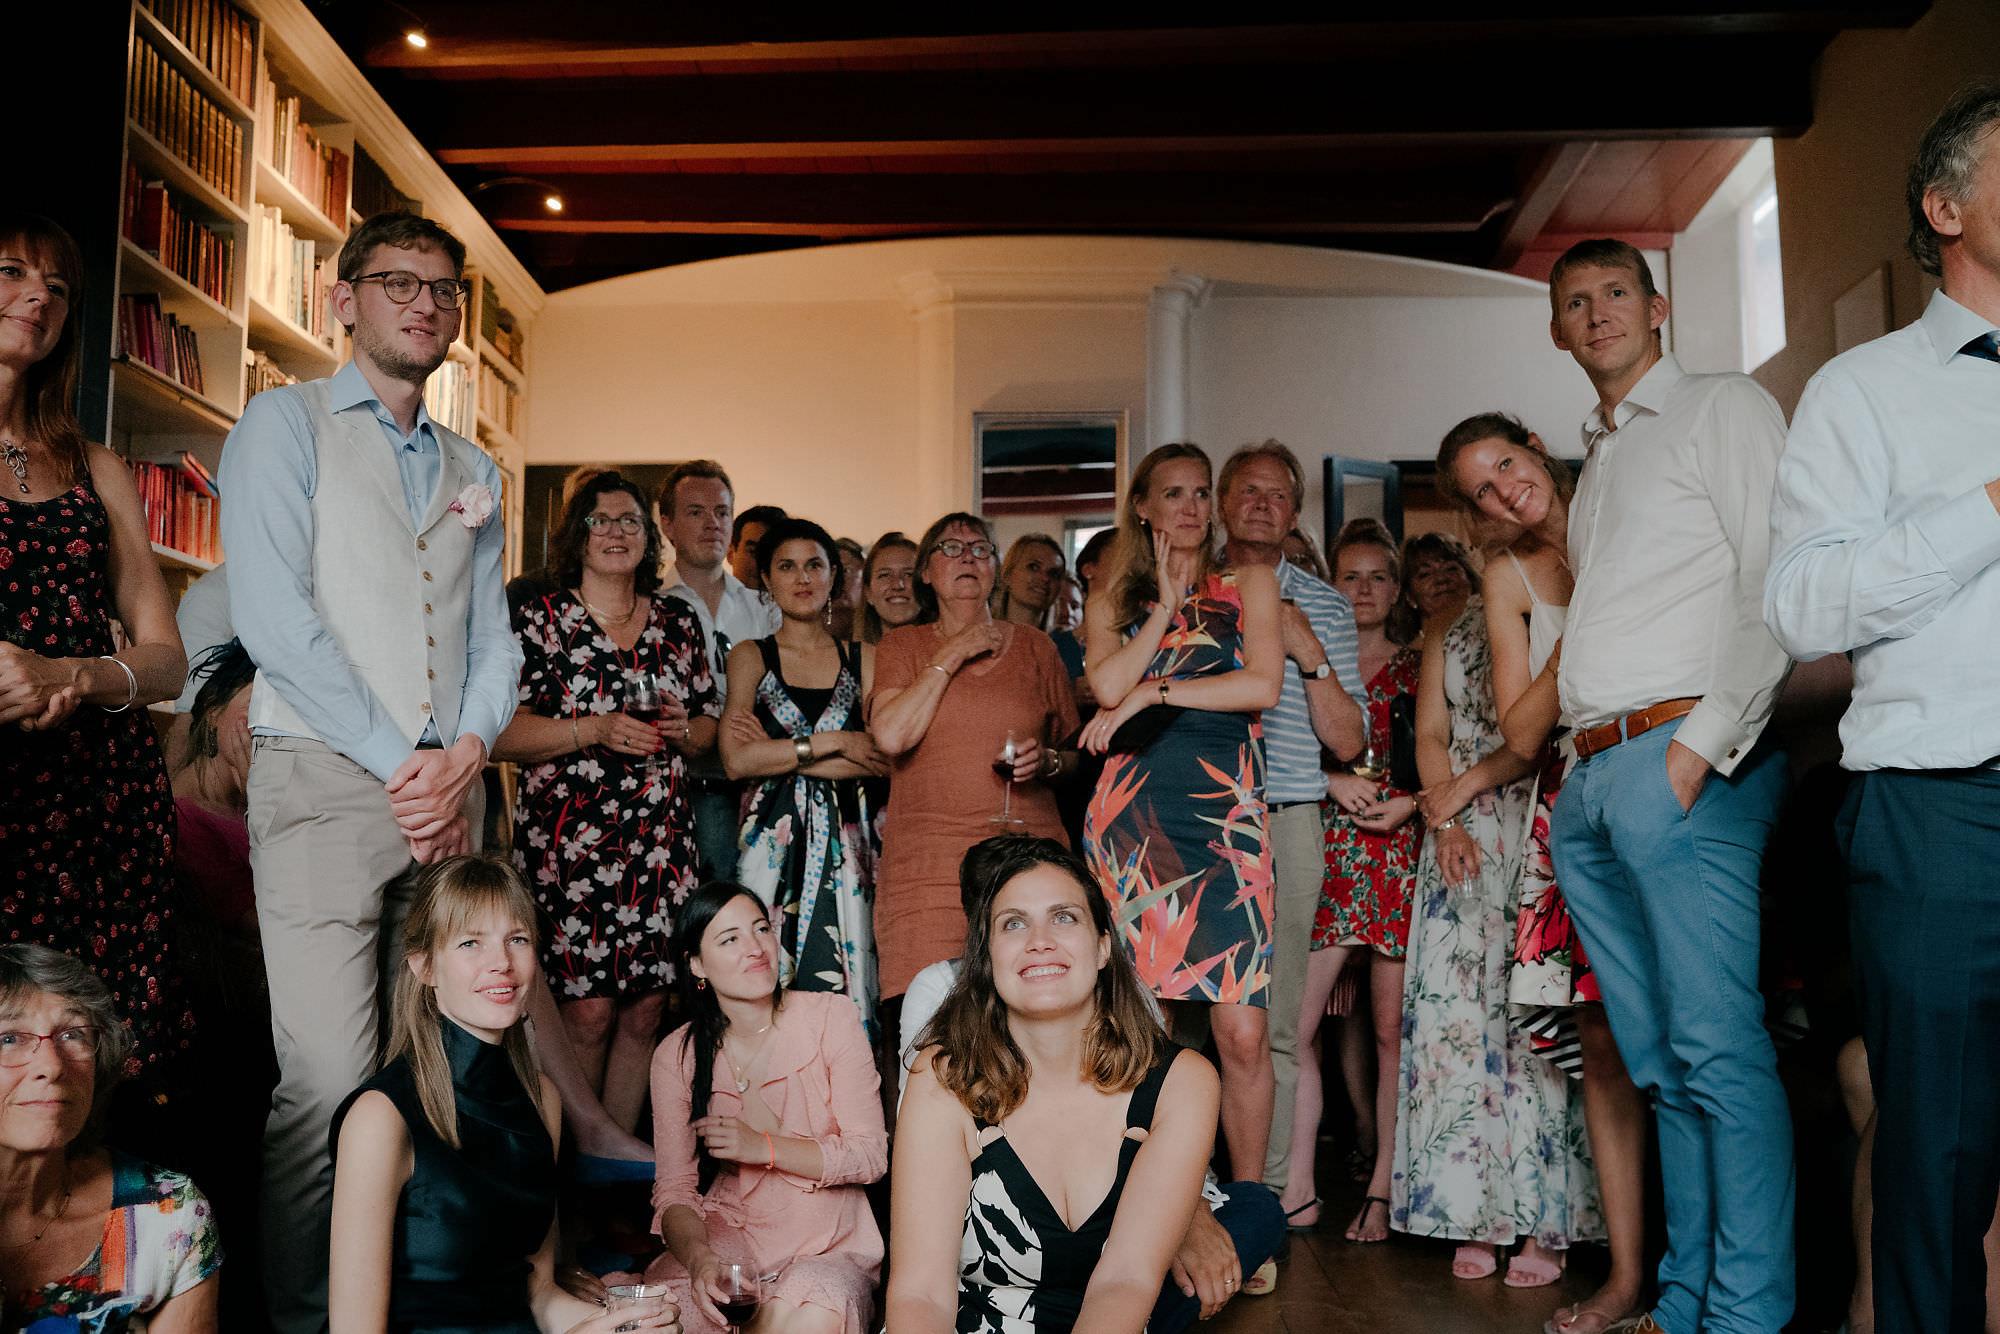 wedding photography party amsterdam utrecht mark hadden